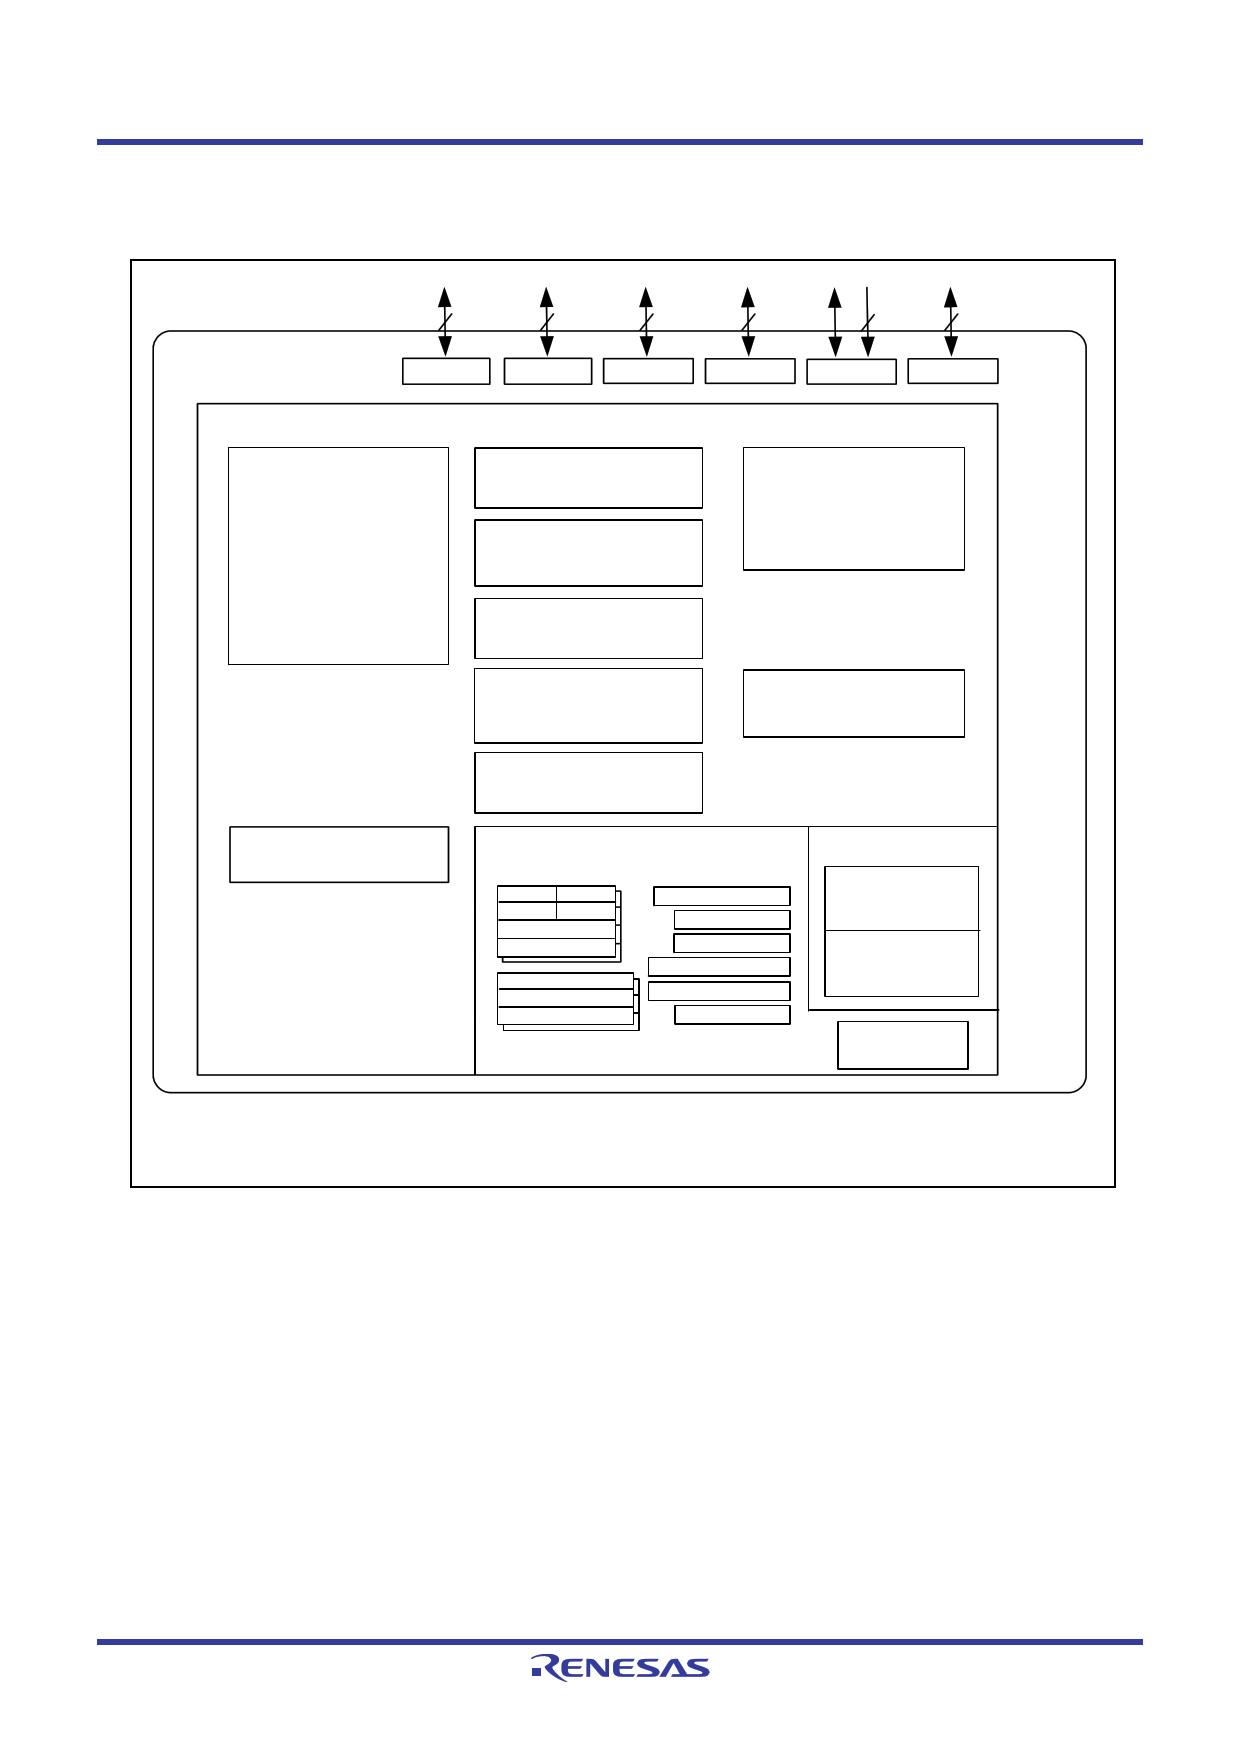 R5F21236DFP pdf, 반도체, 판매, 대치품